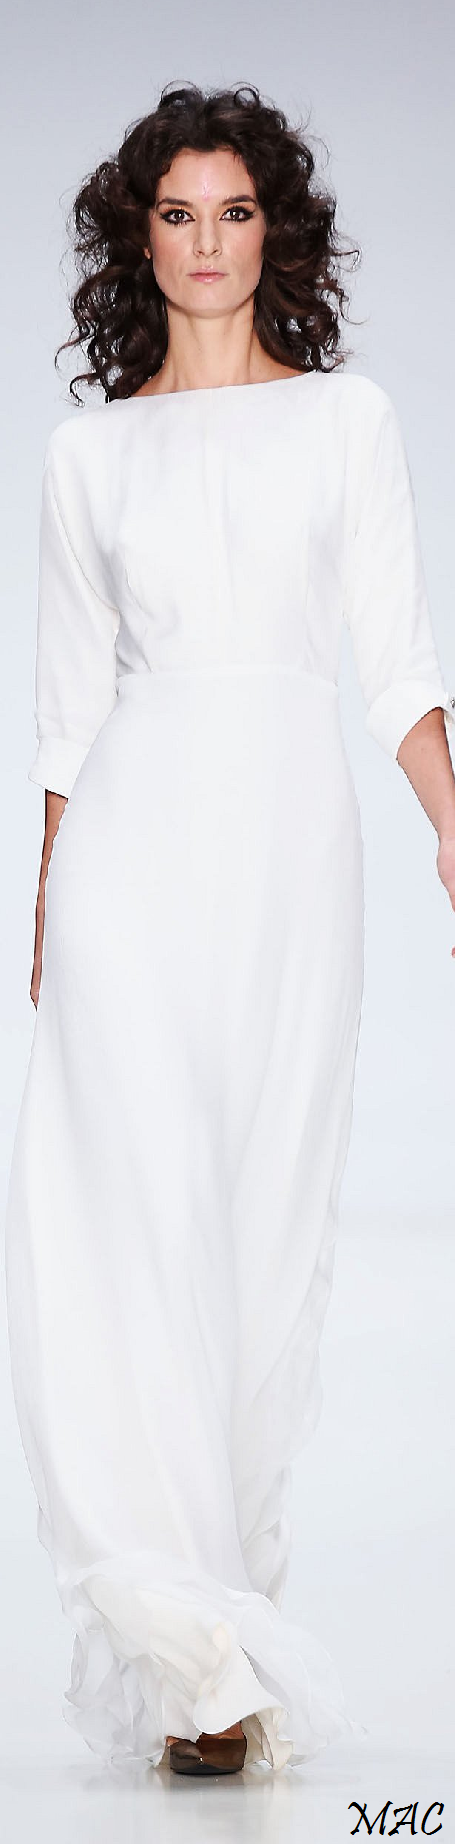 Spring 2015 Ready-to-Wear MA YA By Maria Didarova